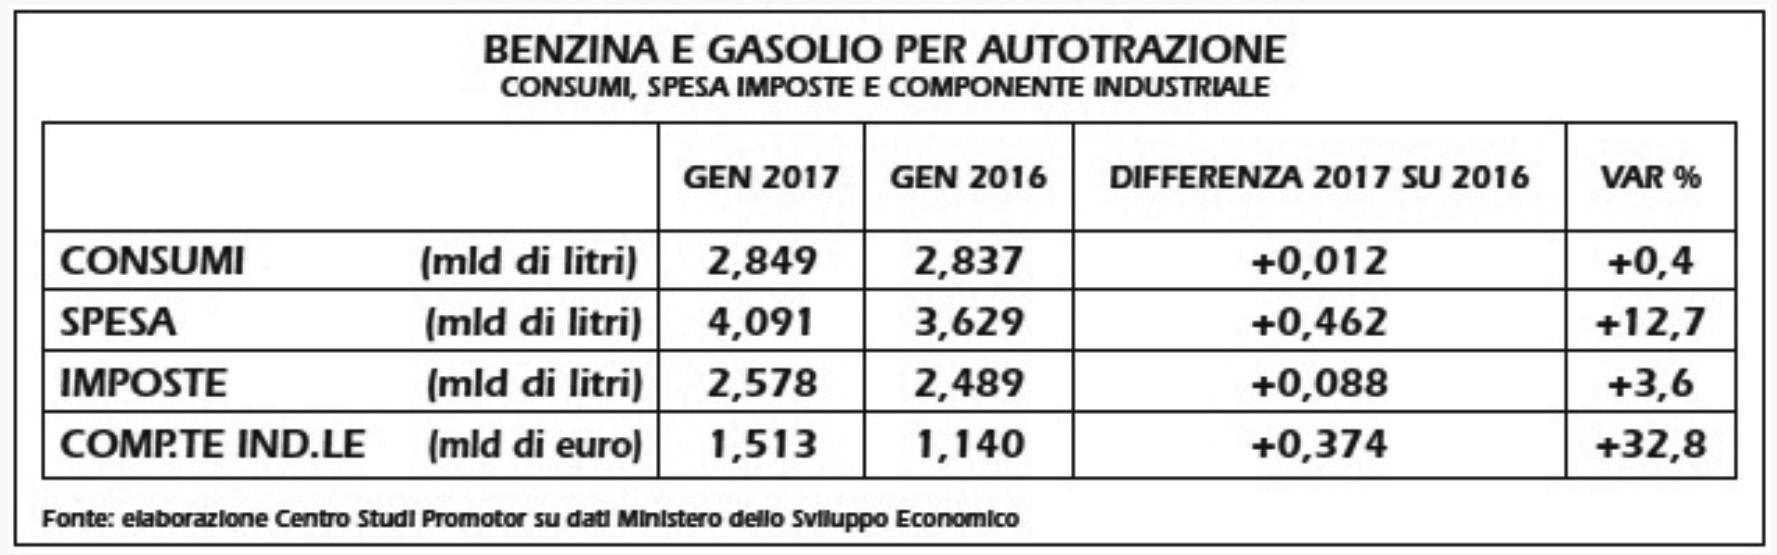 17 Carburanti auto aumento genn 17